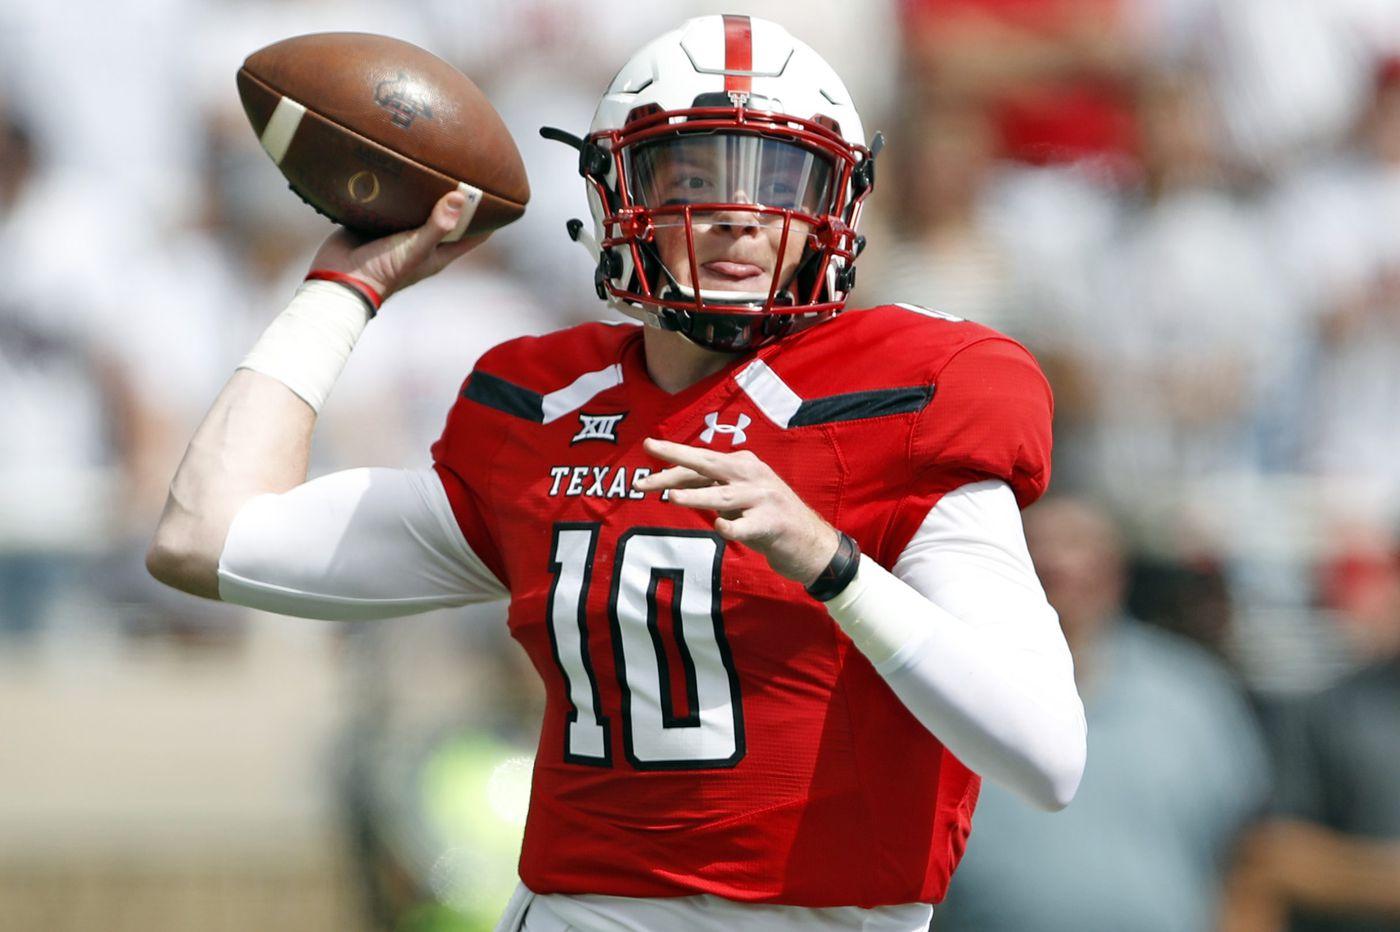 College football preview: Texas Tech sensation Alan Bowman has local roots